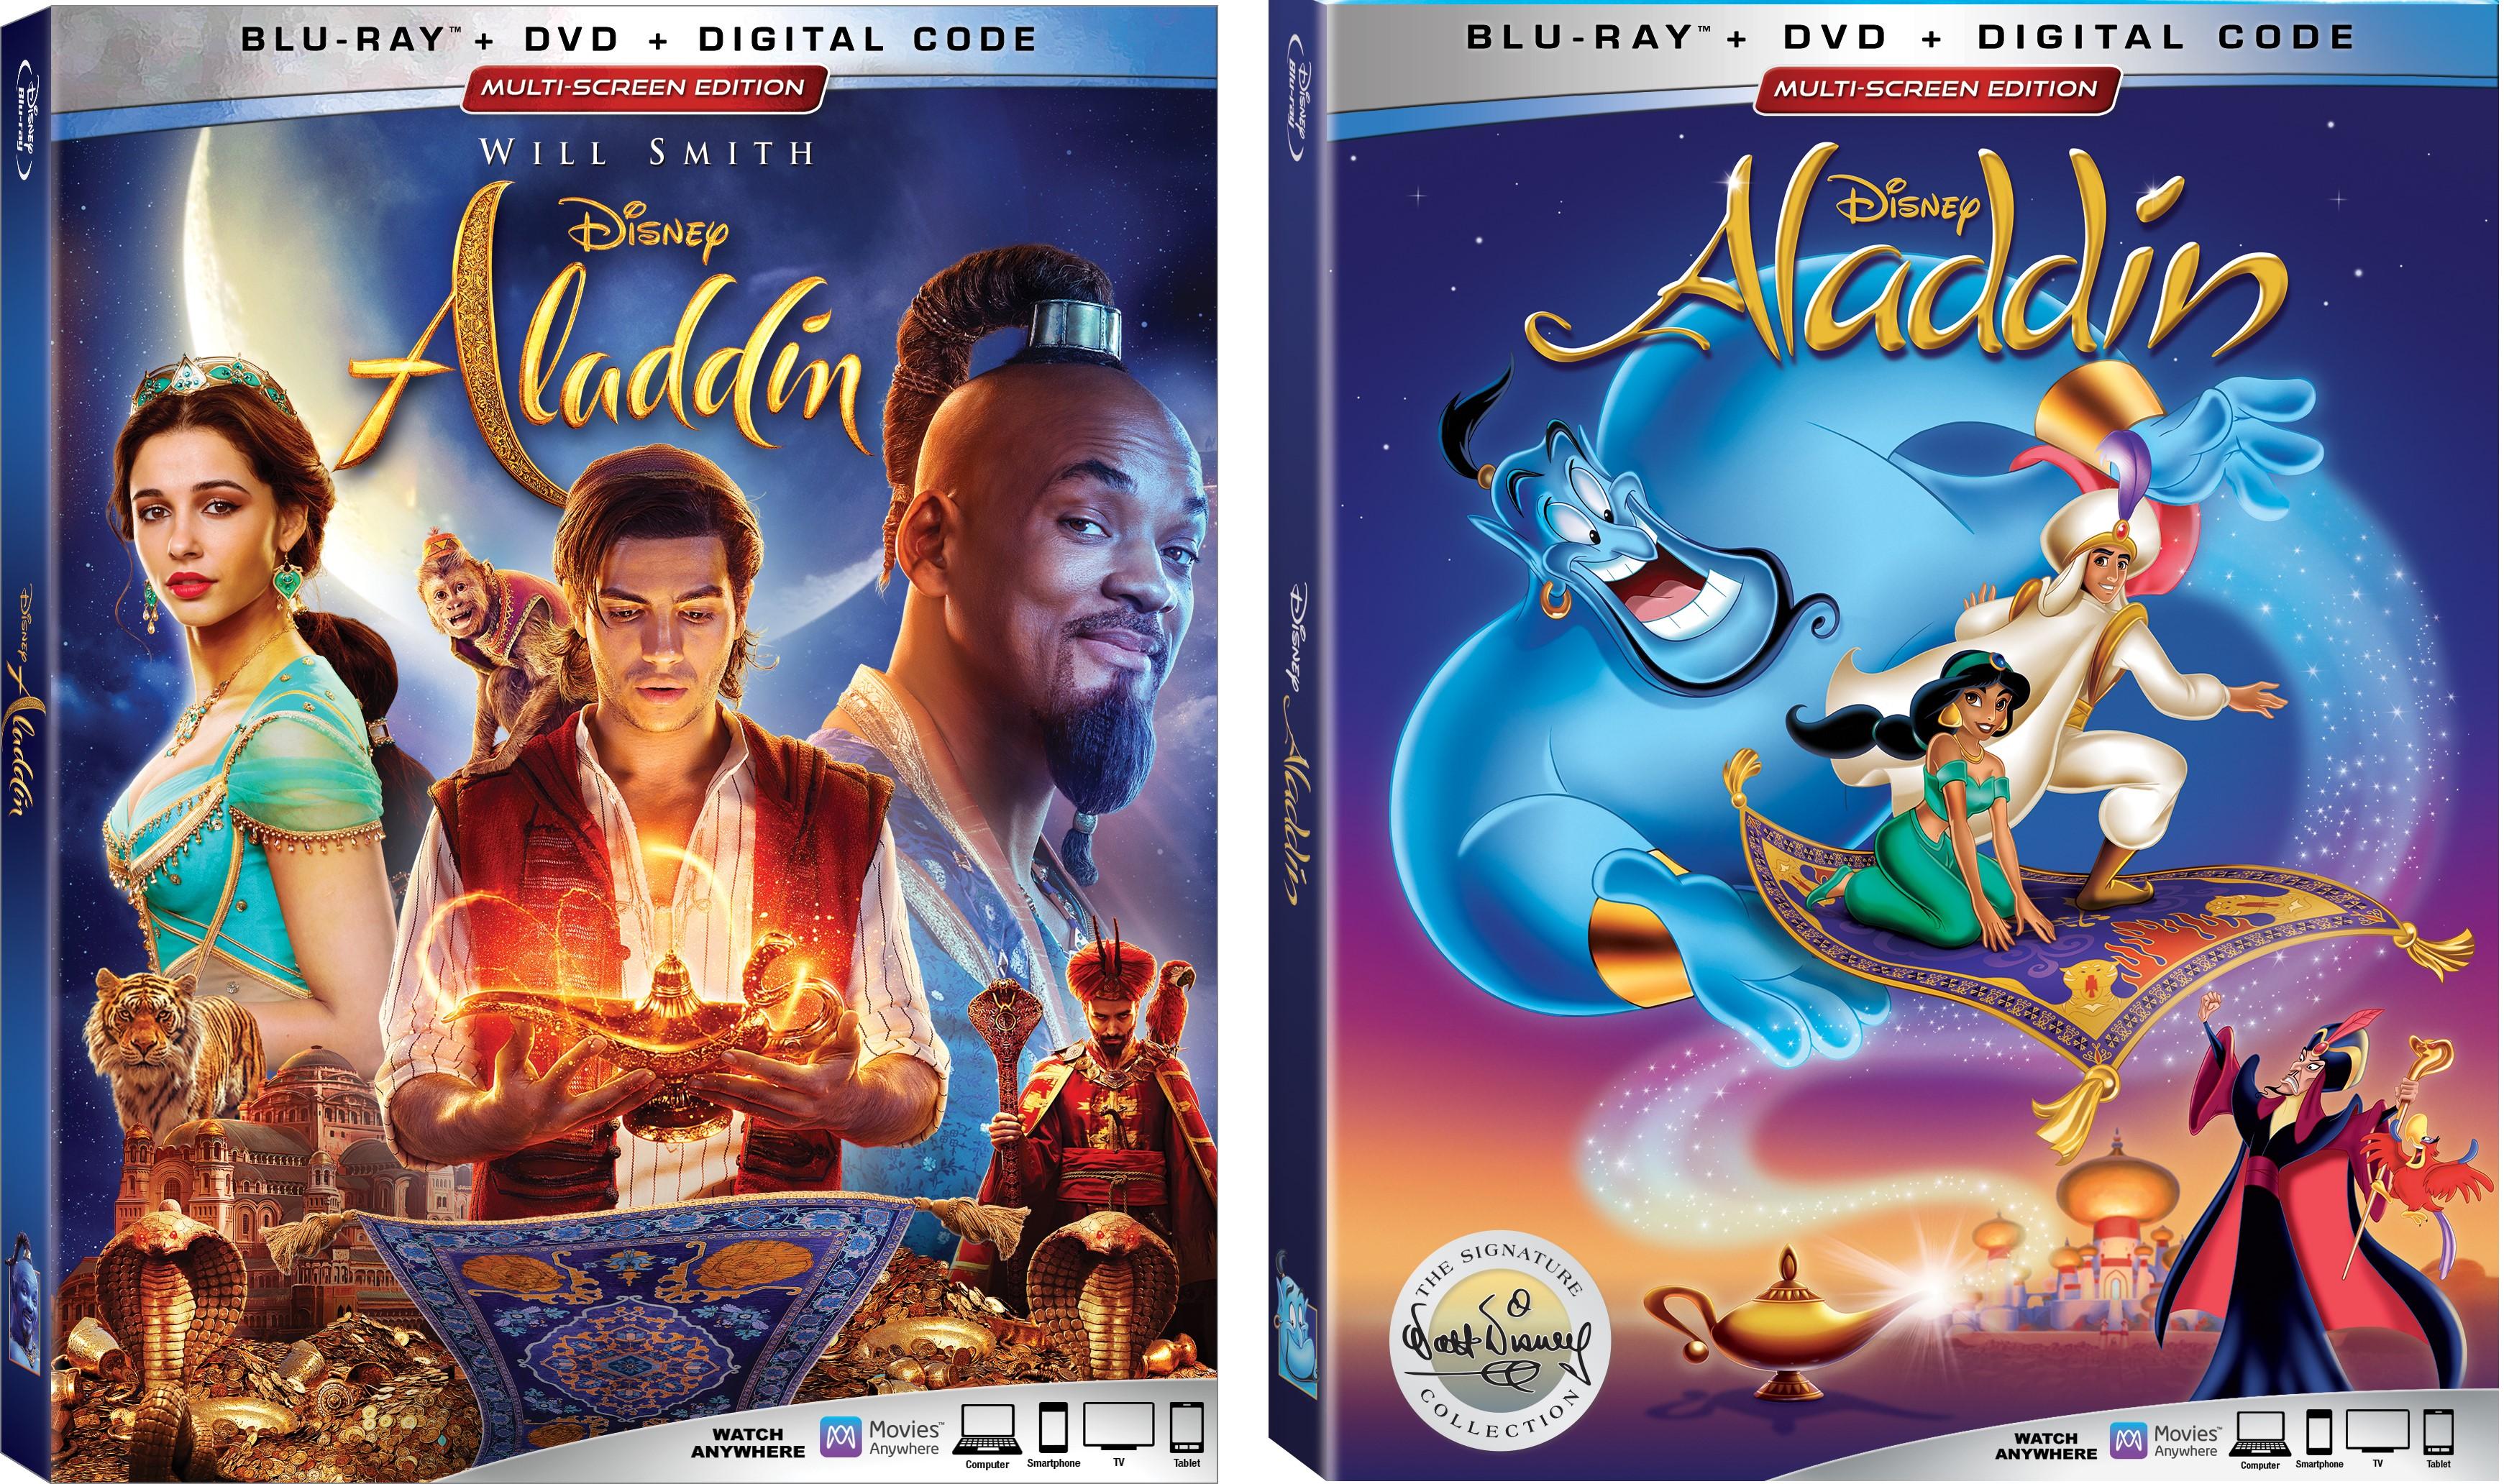 Blu Ray Review Giveaway Aladdin 2019 And Aladdin